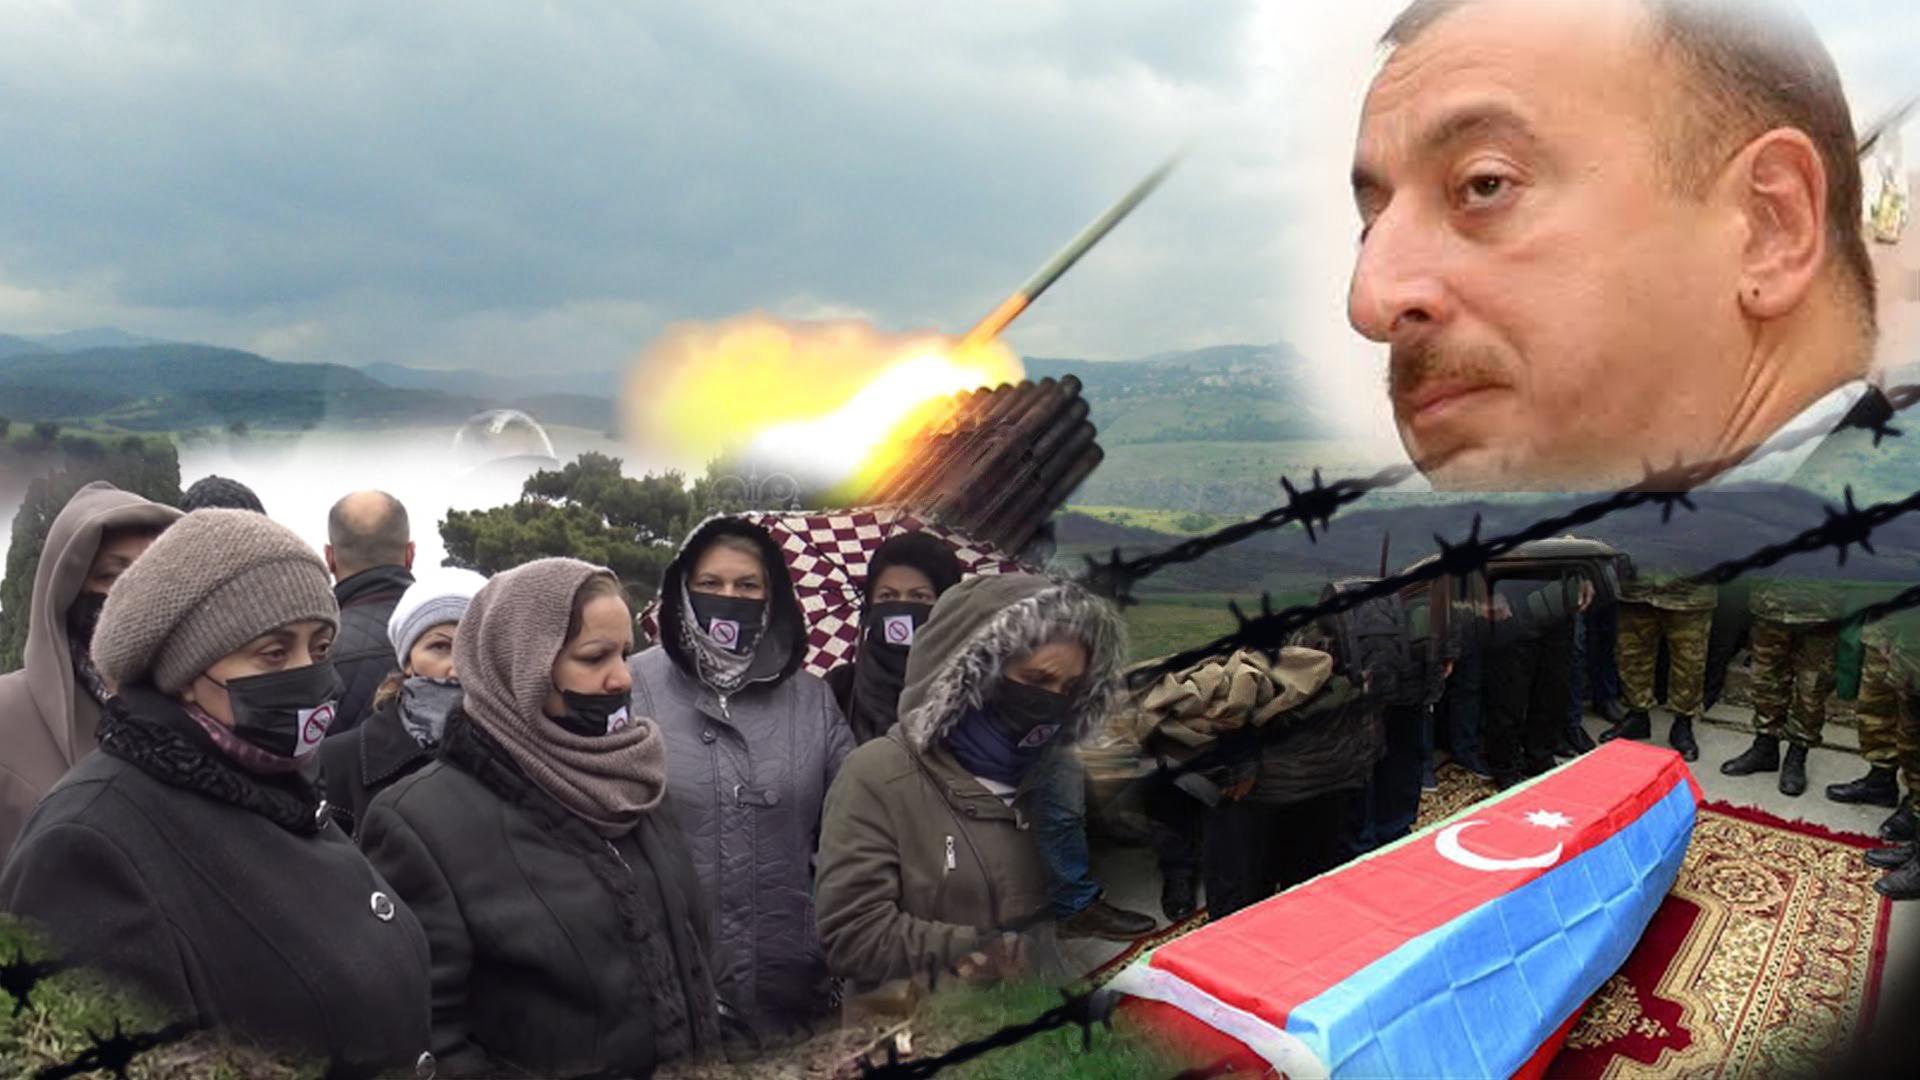 Трон Алиева опасно шатается - Азербайджан скоро будет не таким, каким был  до 27 сентября